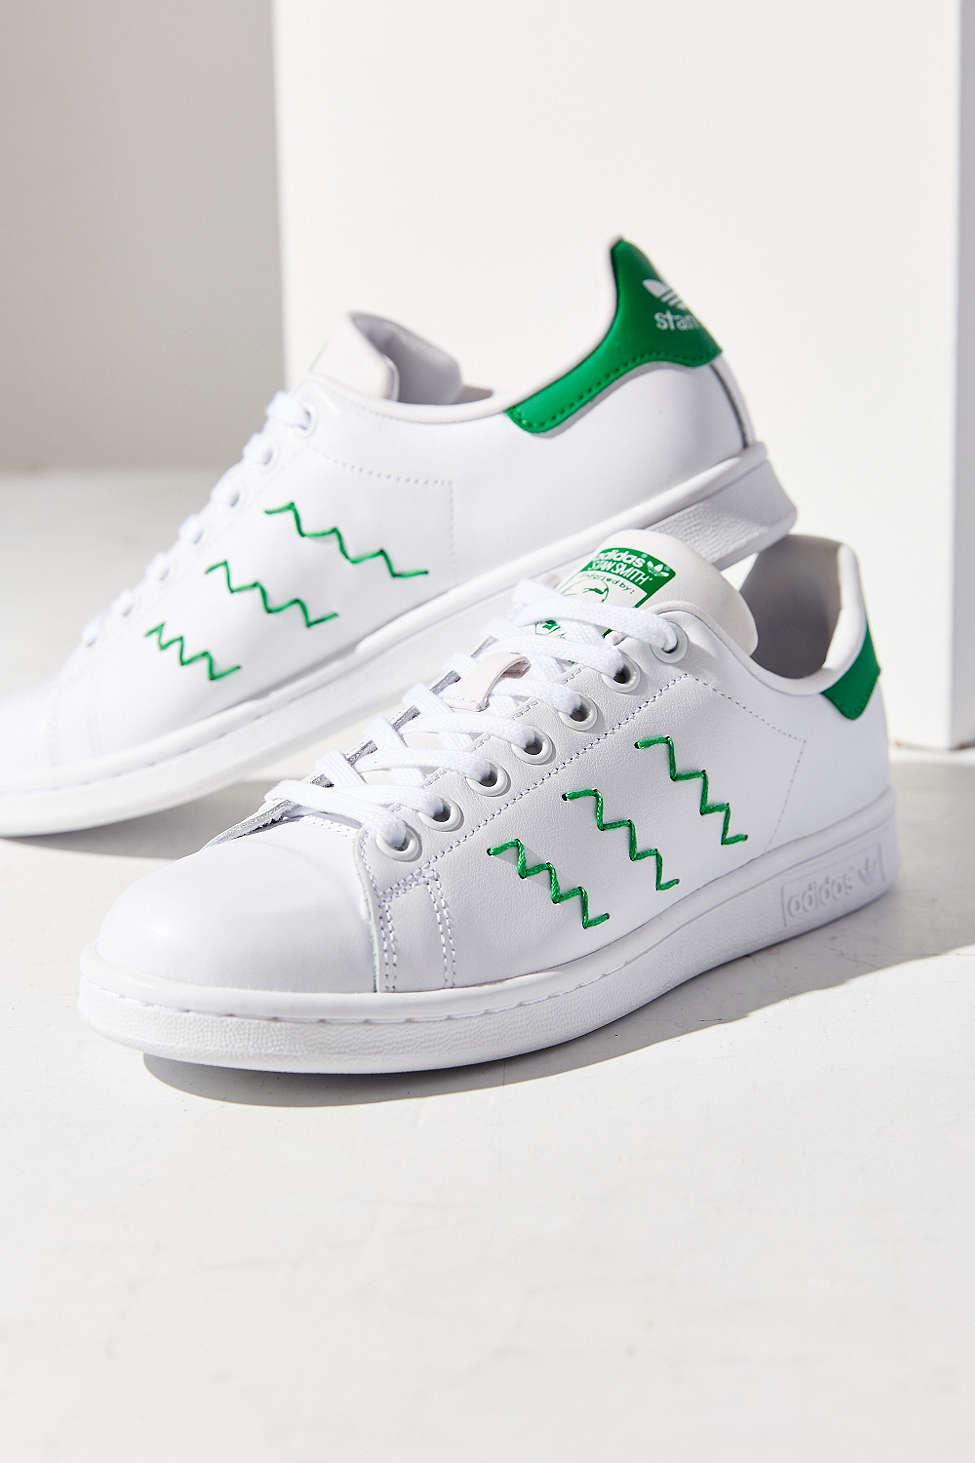 adidas Originals Leather Zig Zag Stan Smith Sneaker in White - Lyst